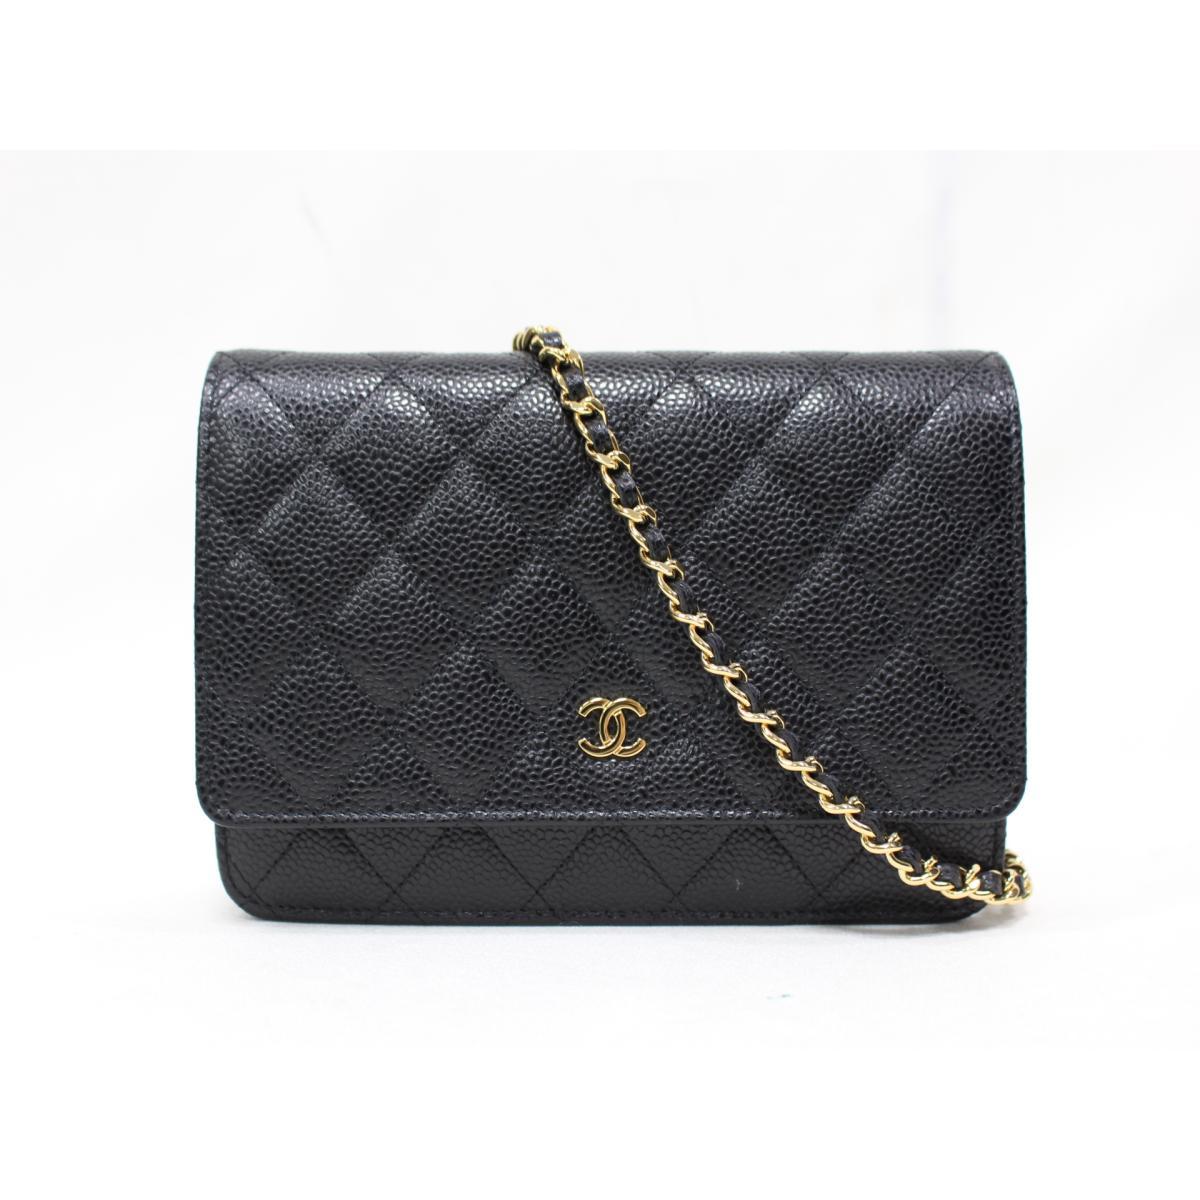 a6eae555bd3f8 Authentic CHANEL Chain wallet Shoulder Bag Purse A33814 Caviar Leather